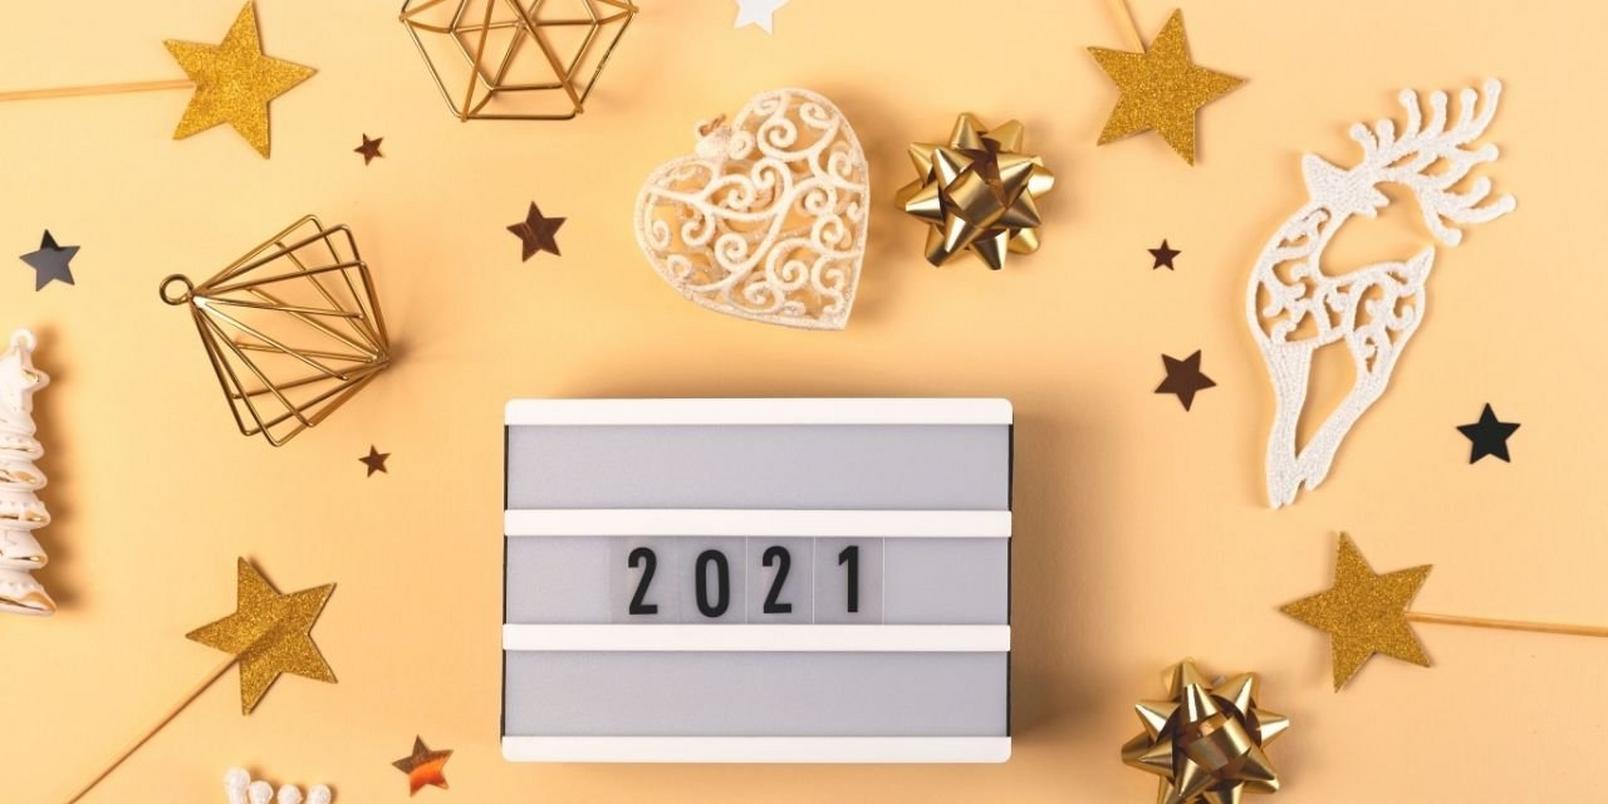 Untitled-design-61-new-year-21-lightbox